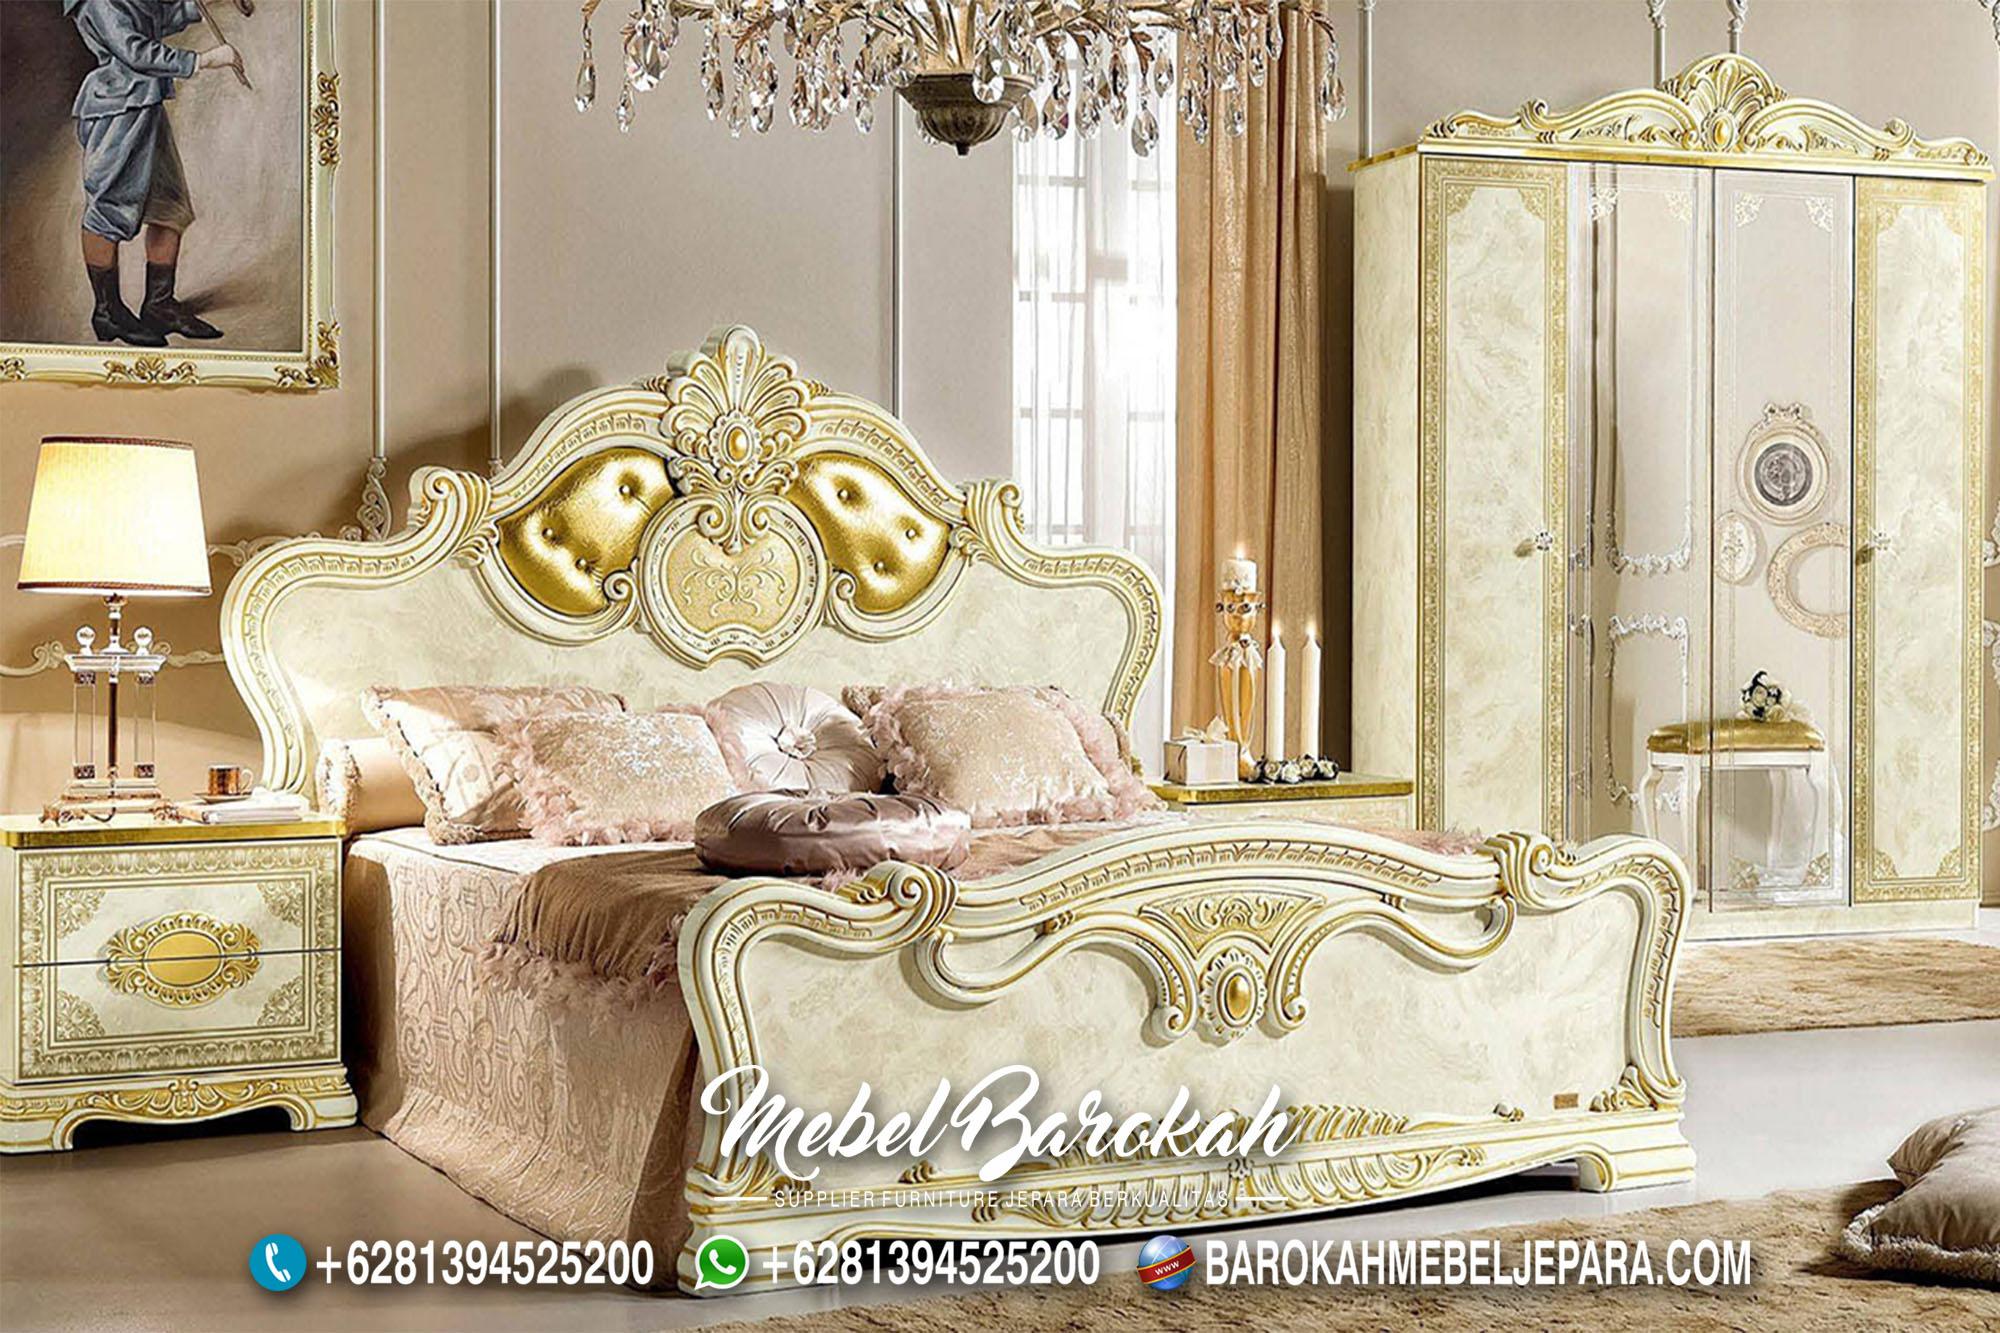 Model Kamar Tidur Ukir Sederhana Murah MB-644